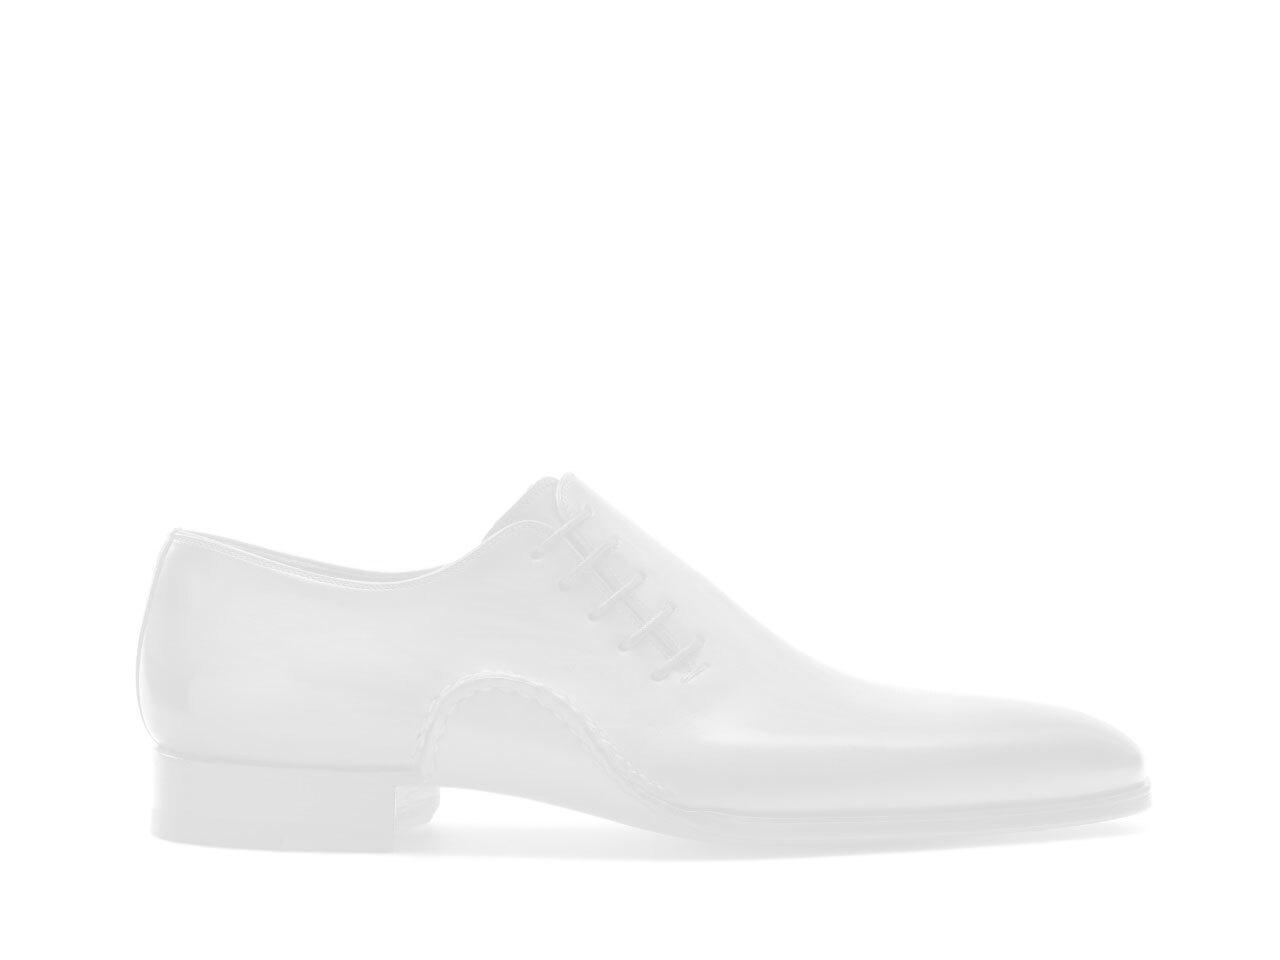 Sole of the Magnanni Carrera Grey Men's Single Monk Strap Shoes